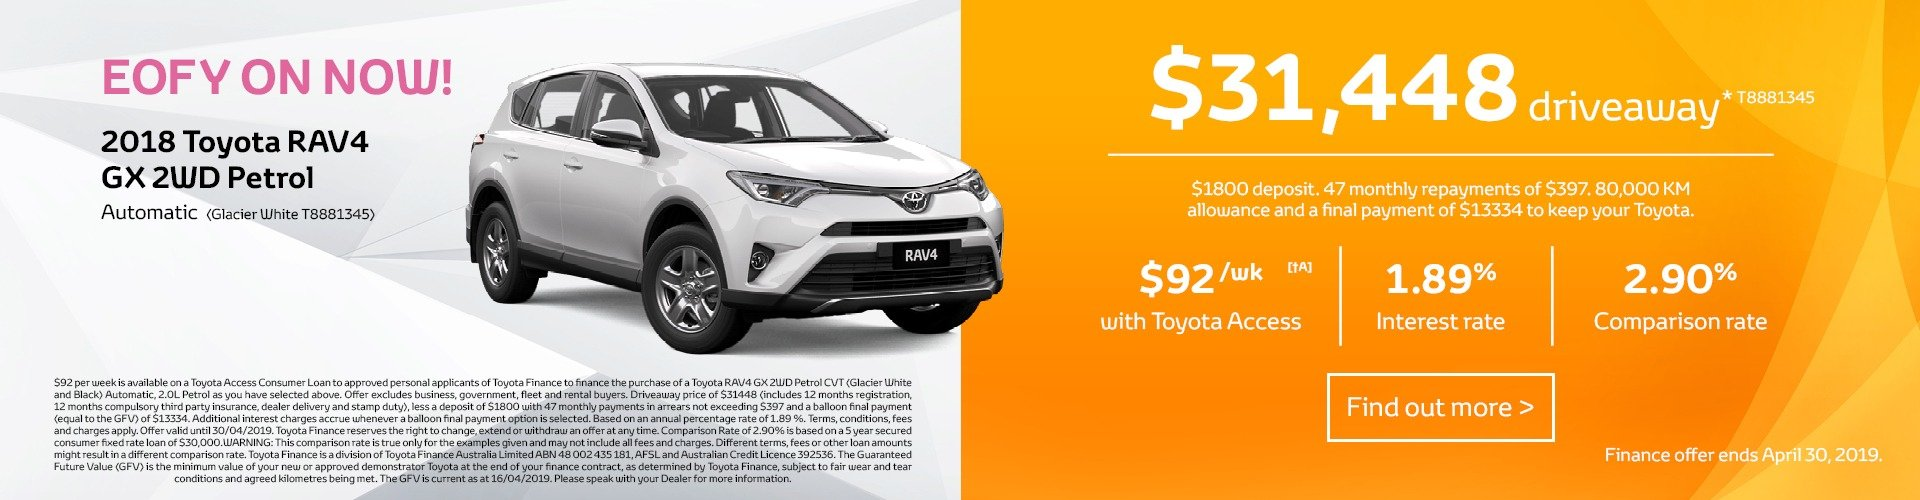 Cardiff Toyota Finance Offer